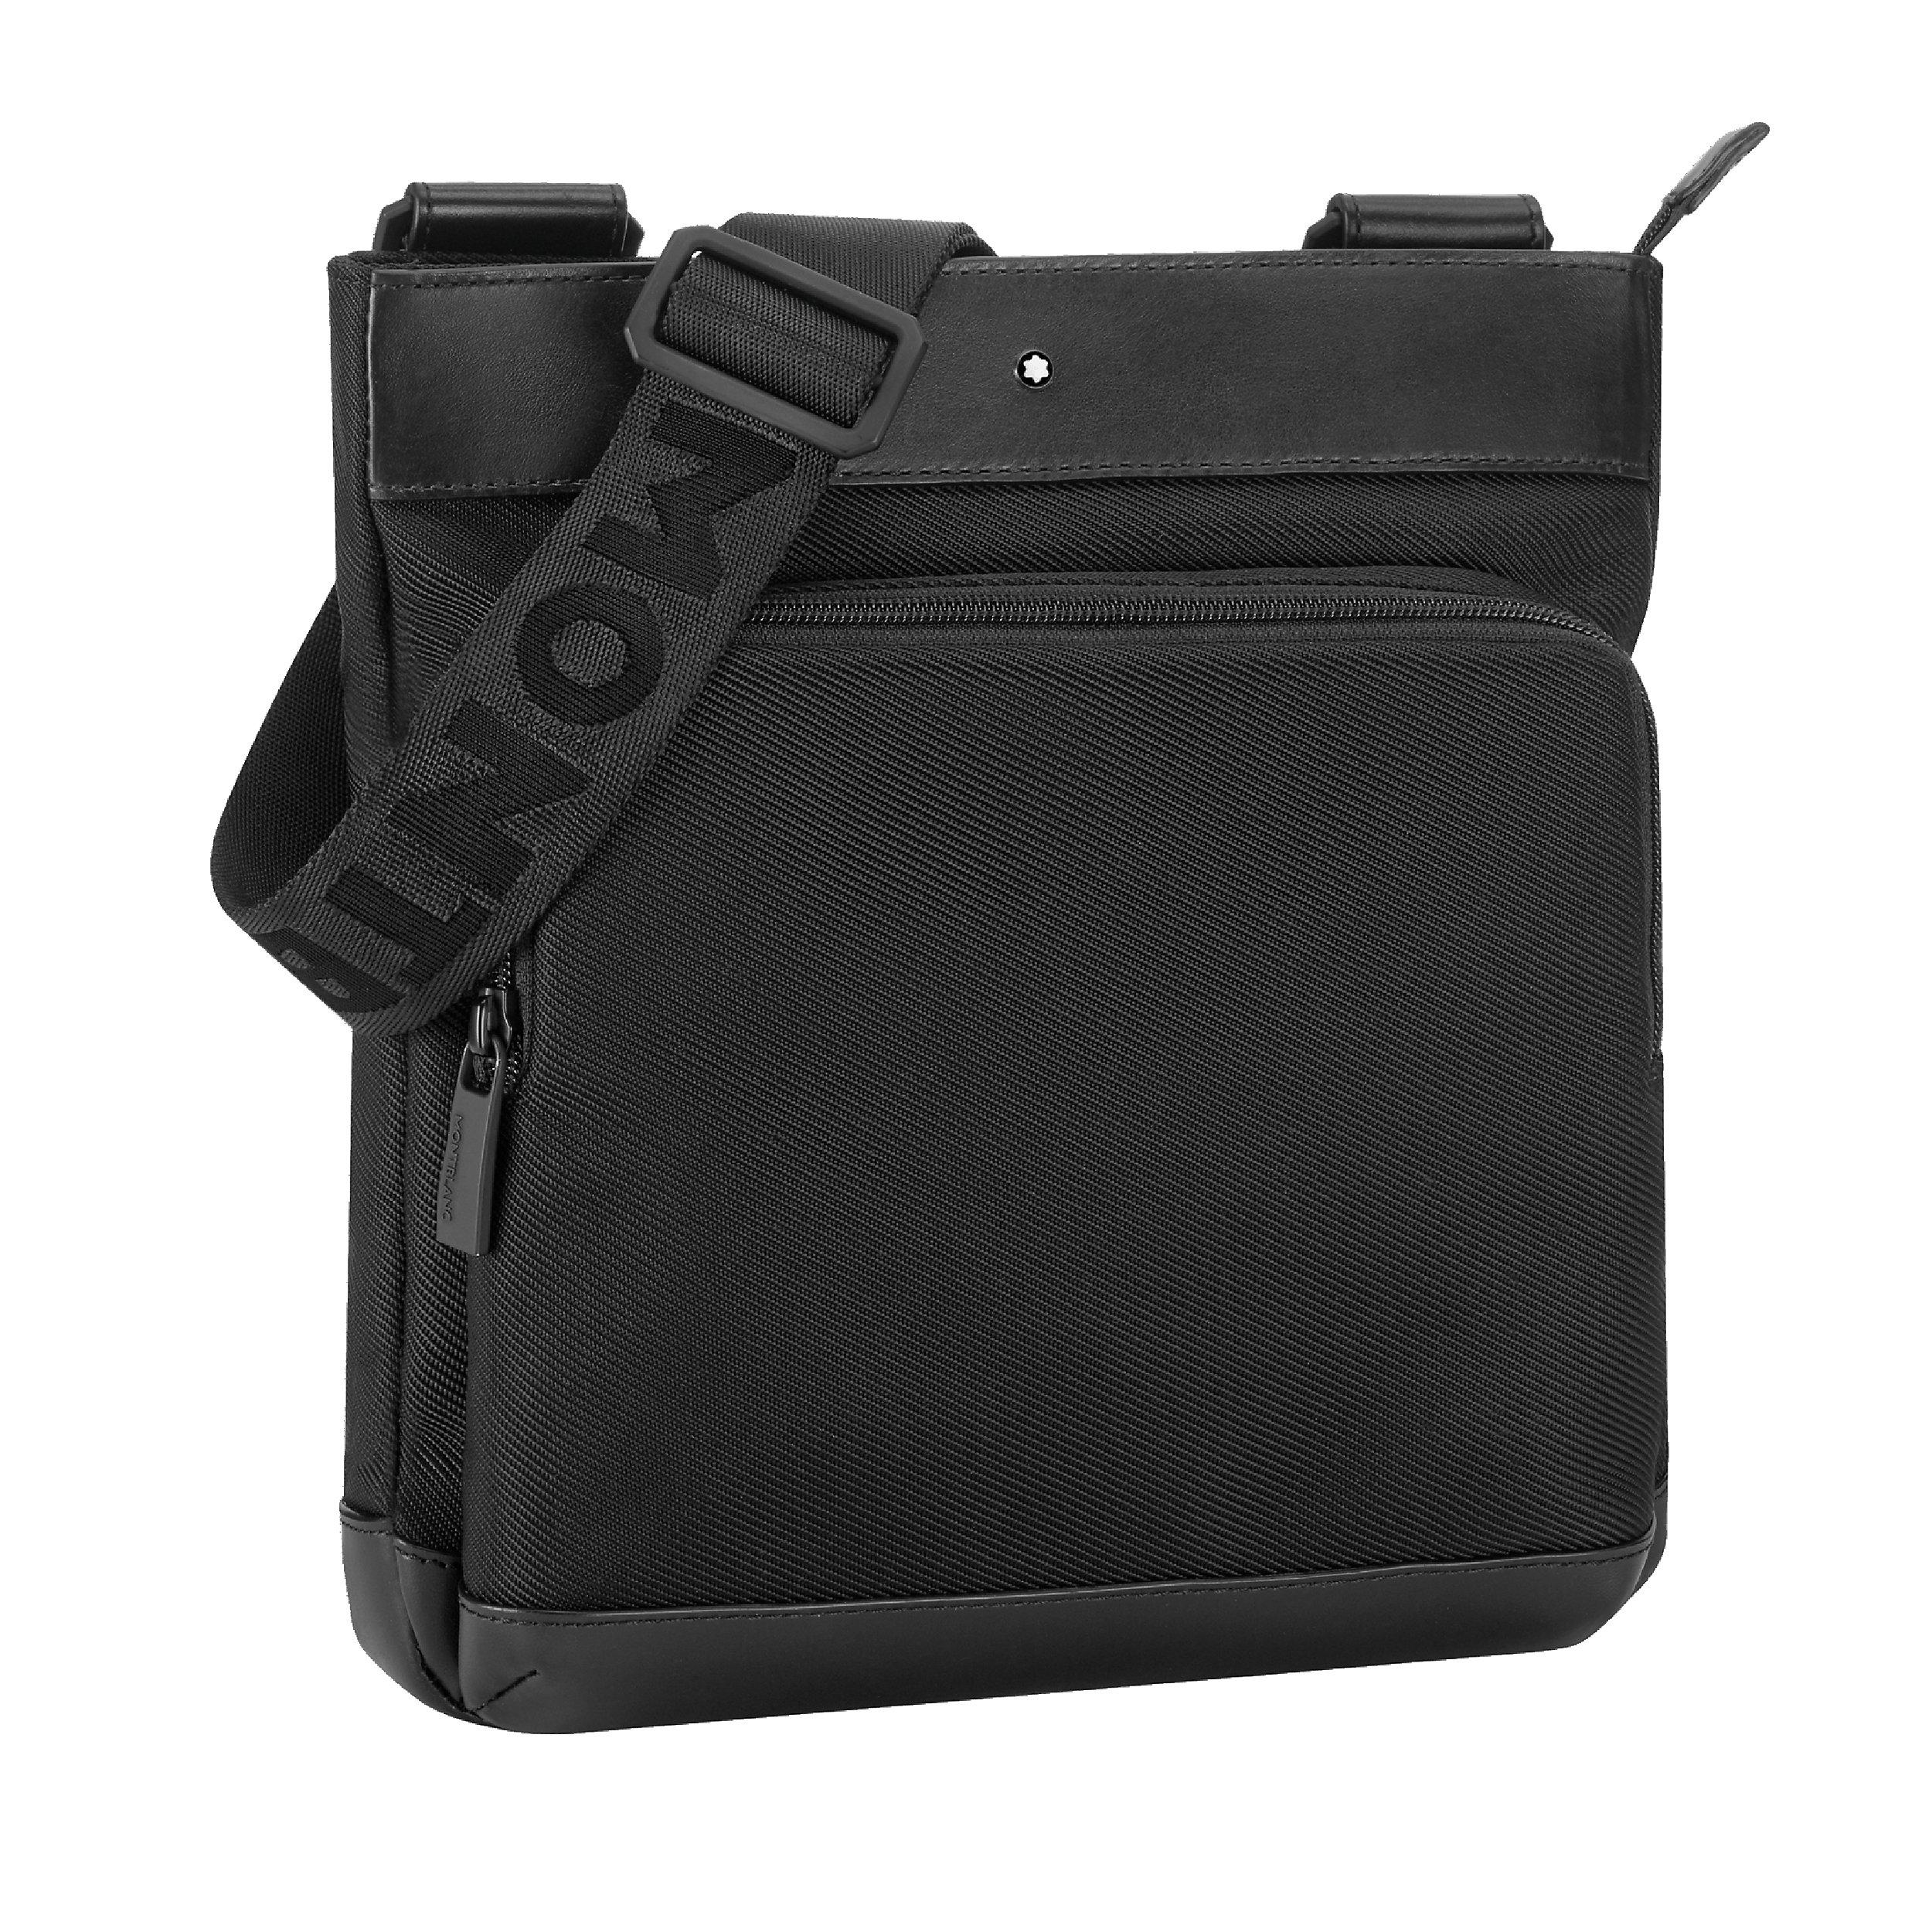 Crossbody Bag Envelope RFID My Montblanc Nightflight